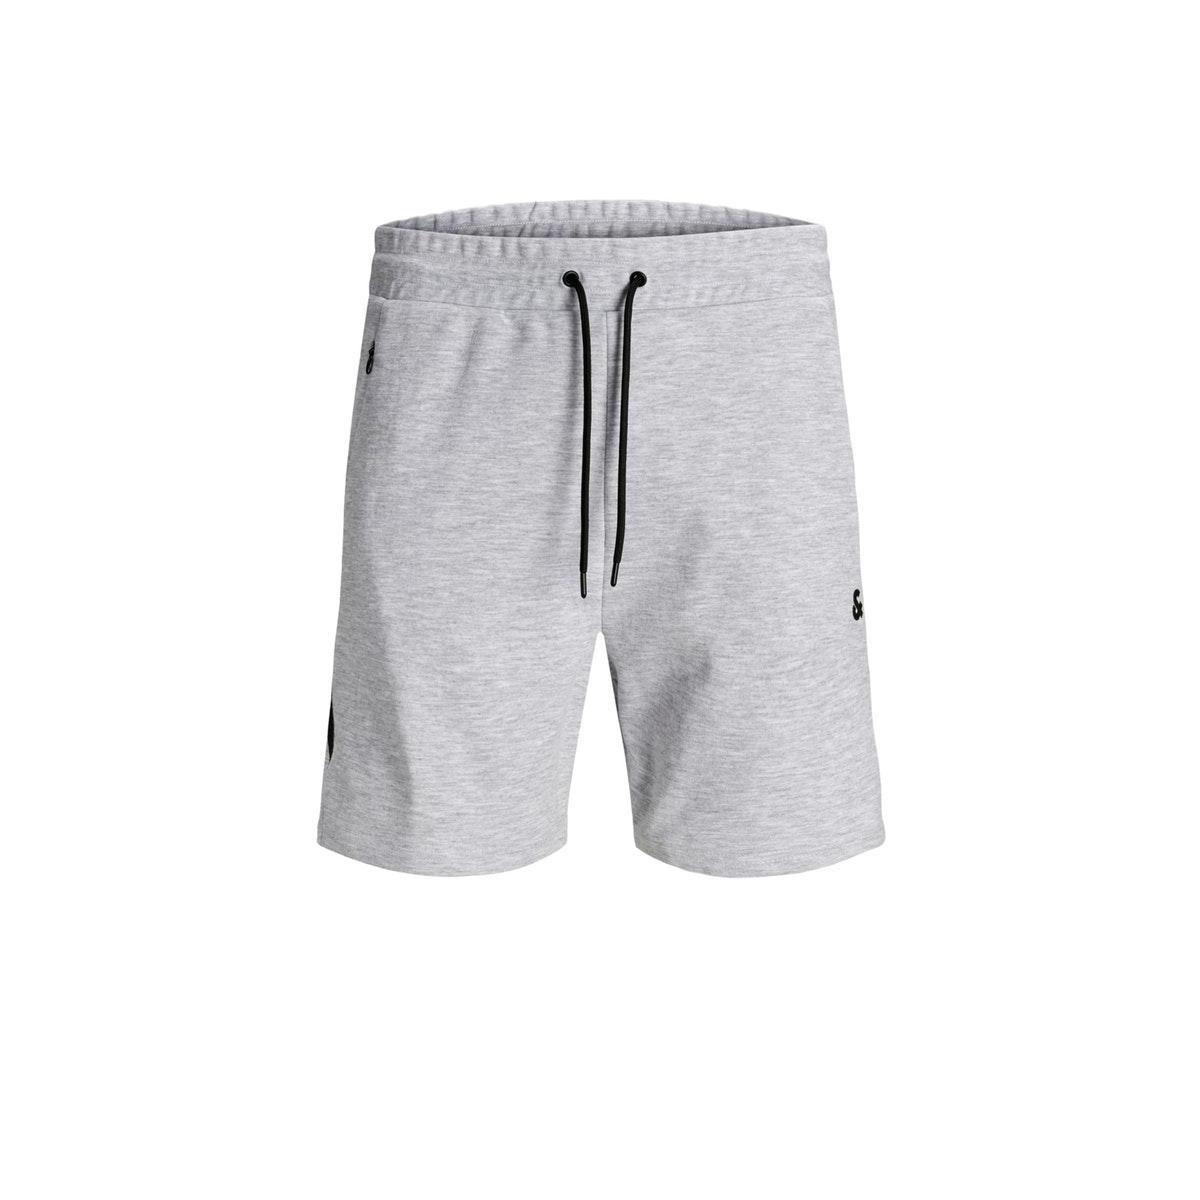 nb shorts